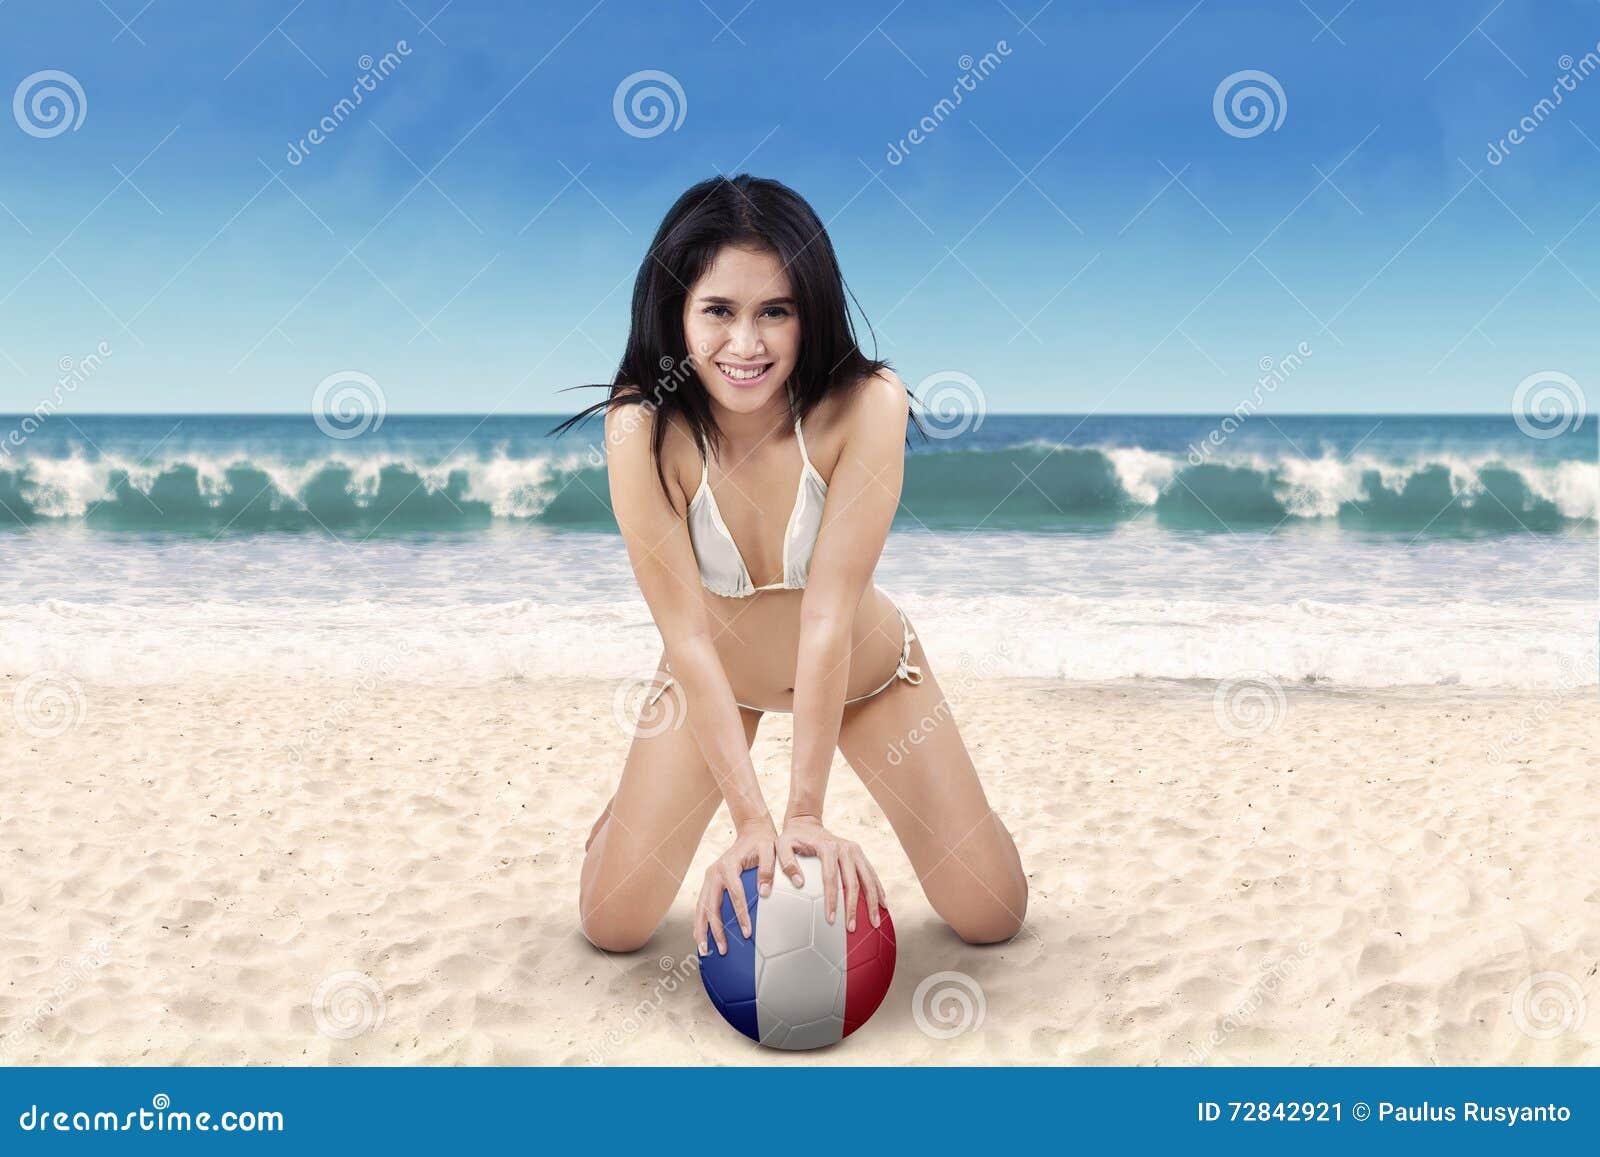 sexy girls am strand